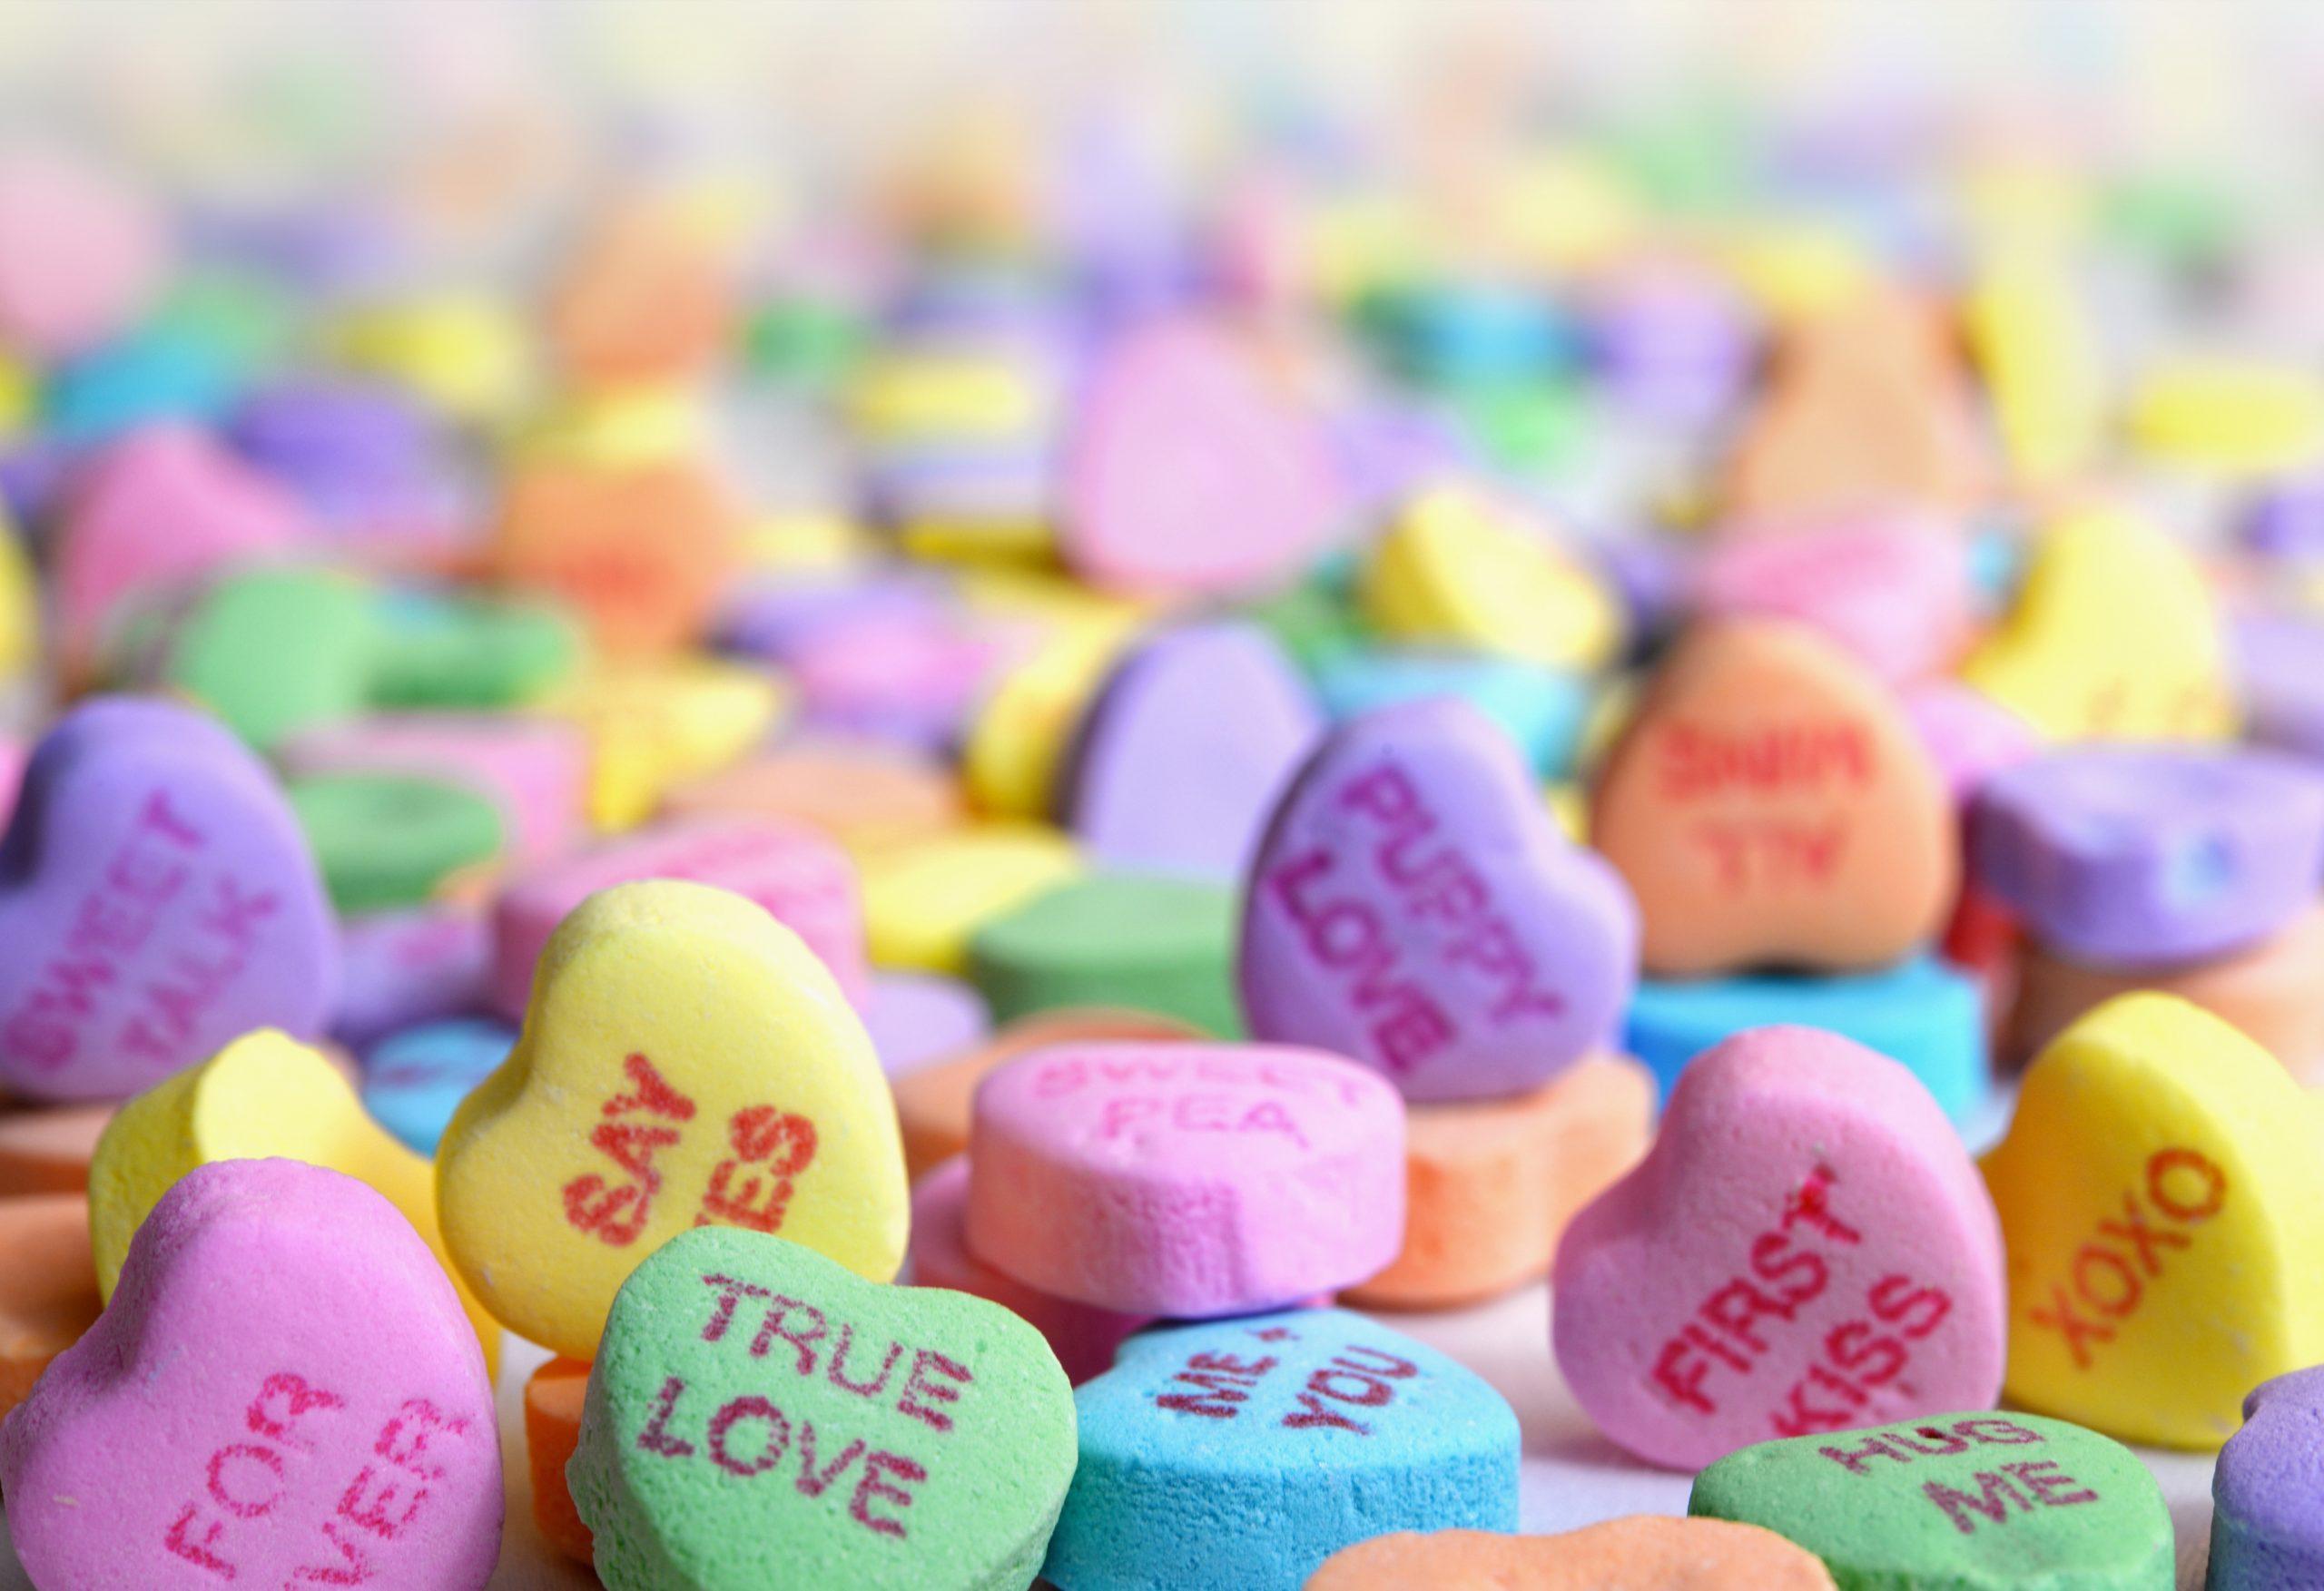 Residents Receive Valentines